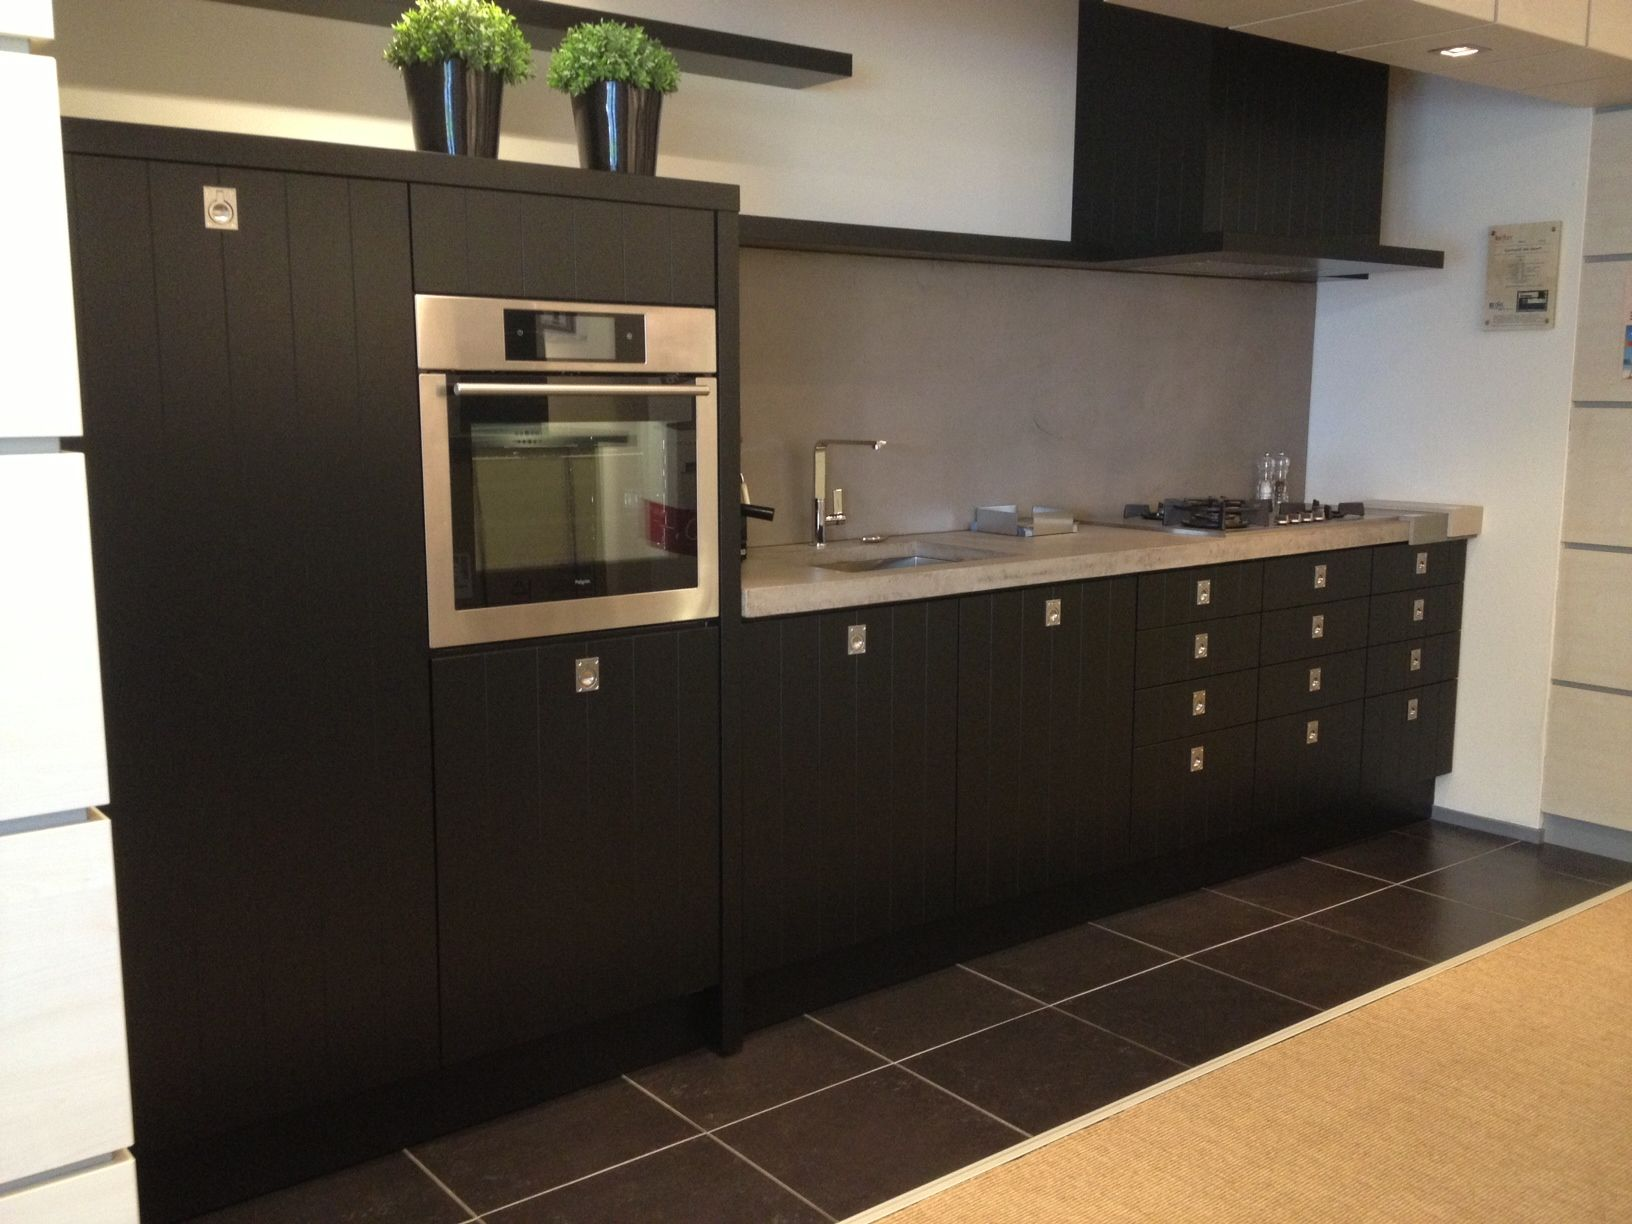 Keukens Zwartwit Nieuwenhuizen : Keukens zwartwit nieuwenhuizen eigen huis en tuin